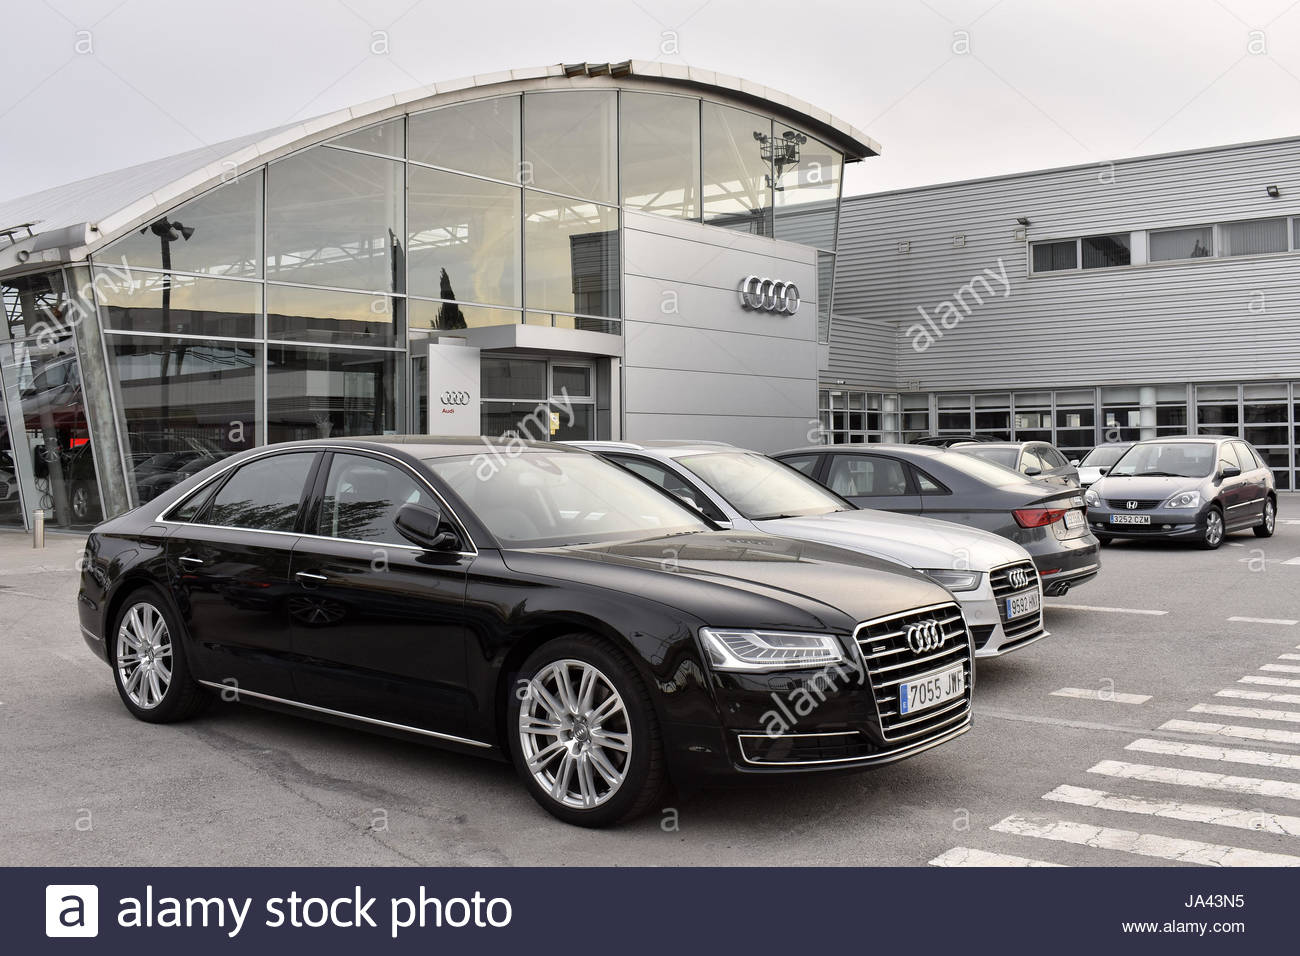 Audi Cars Dealer Store In Barcelona Spain Europe Stock Photo